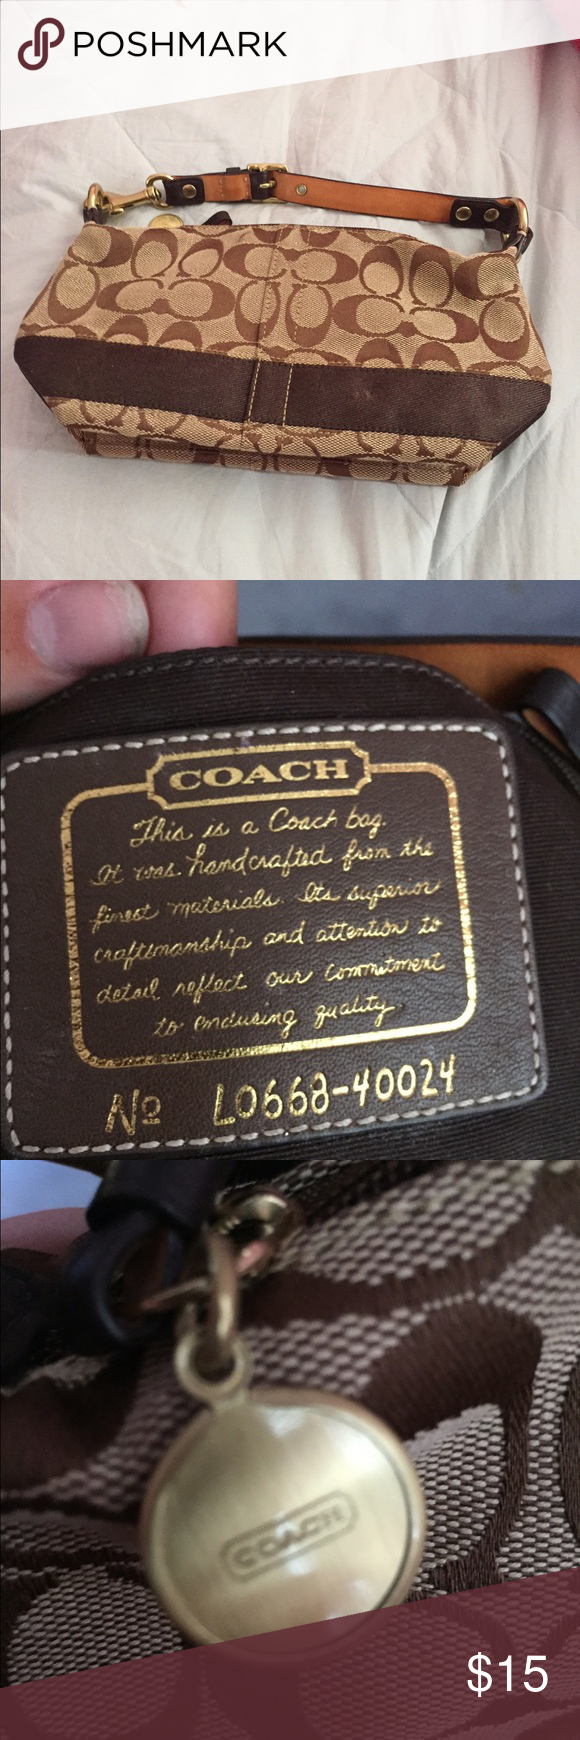 Coach handbag Great condition Bags Mini Bags